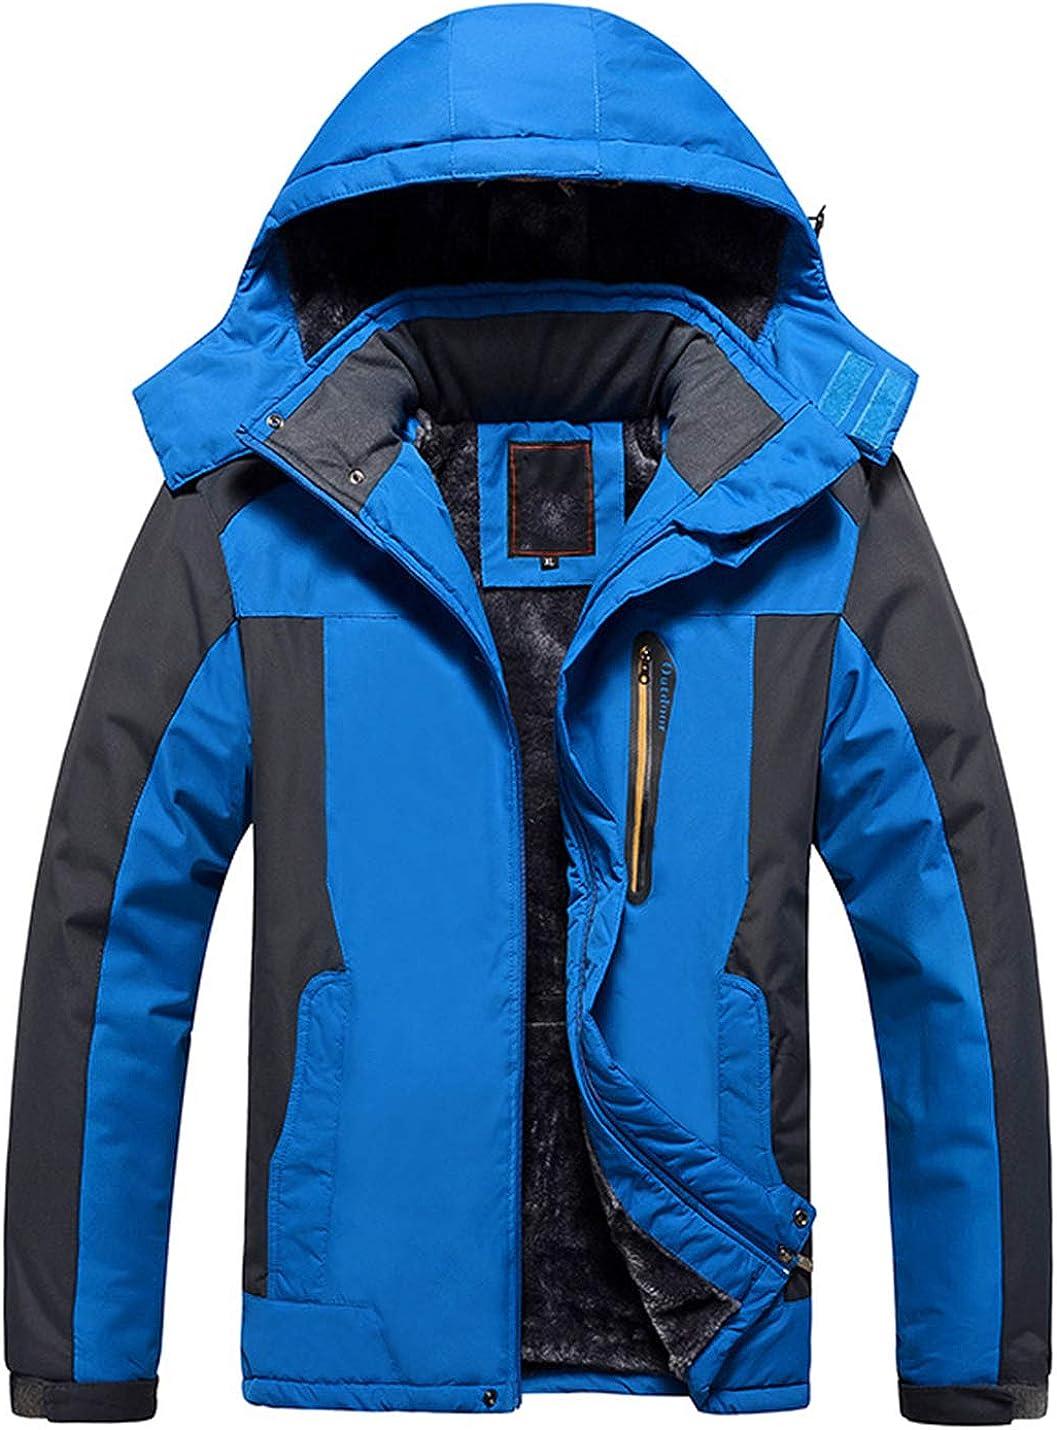 Uaneo Men's Casual Detachable Hood Fleece Lined Outdoor Mountain Hiking Jackets(Blue-XS)